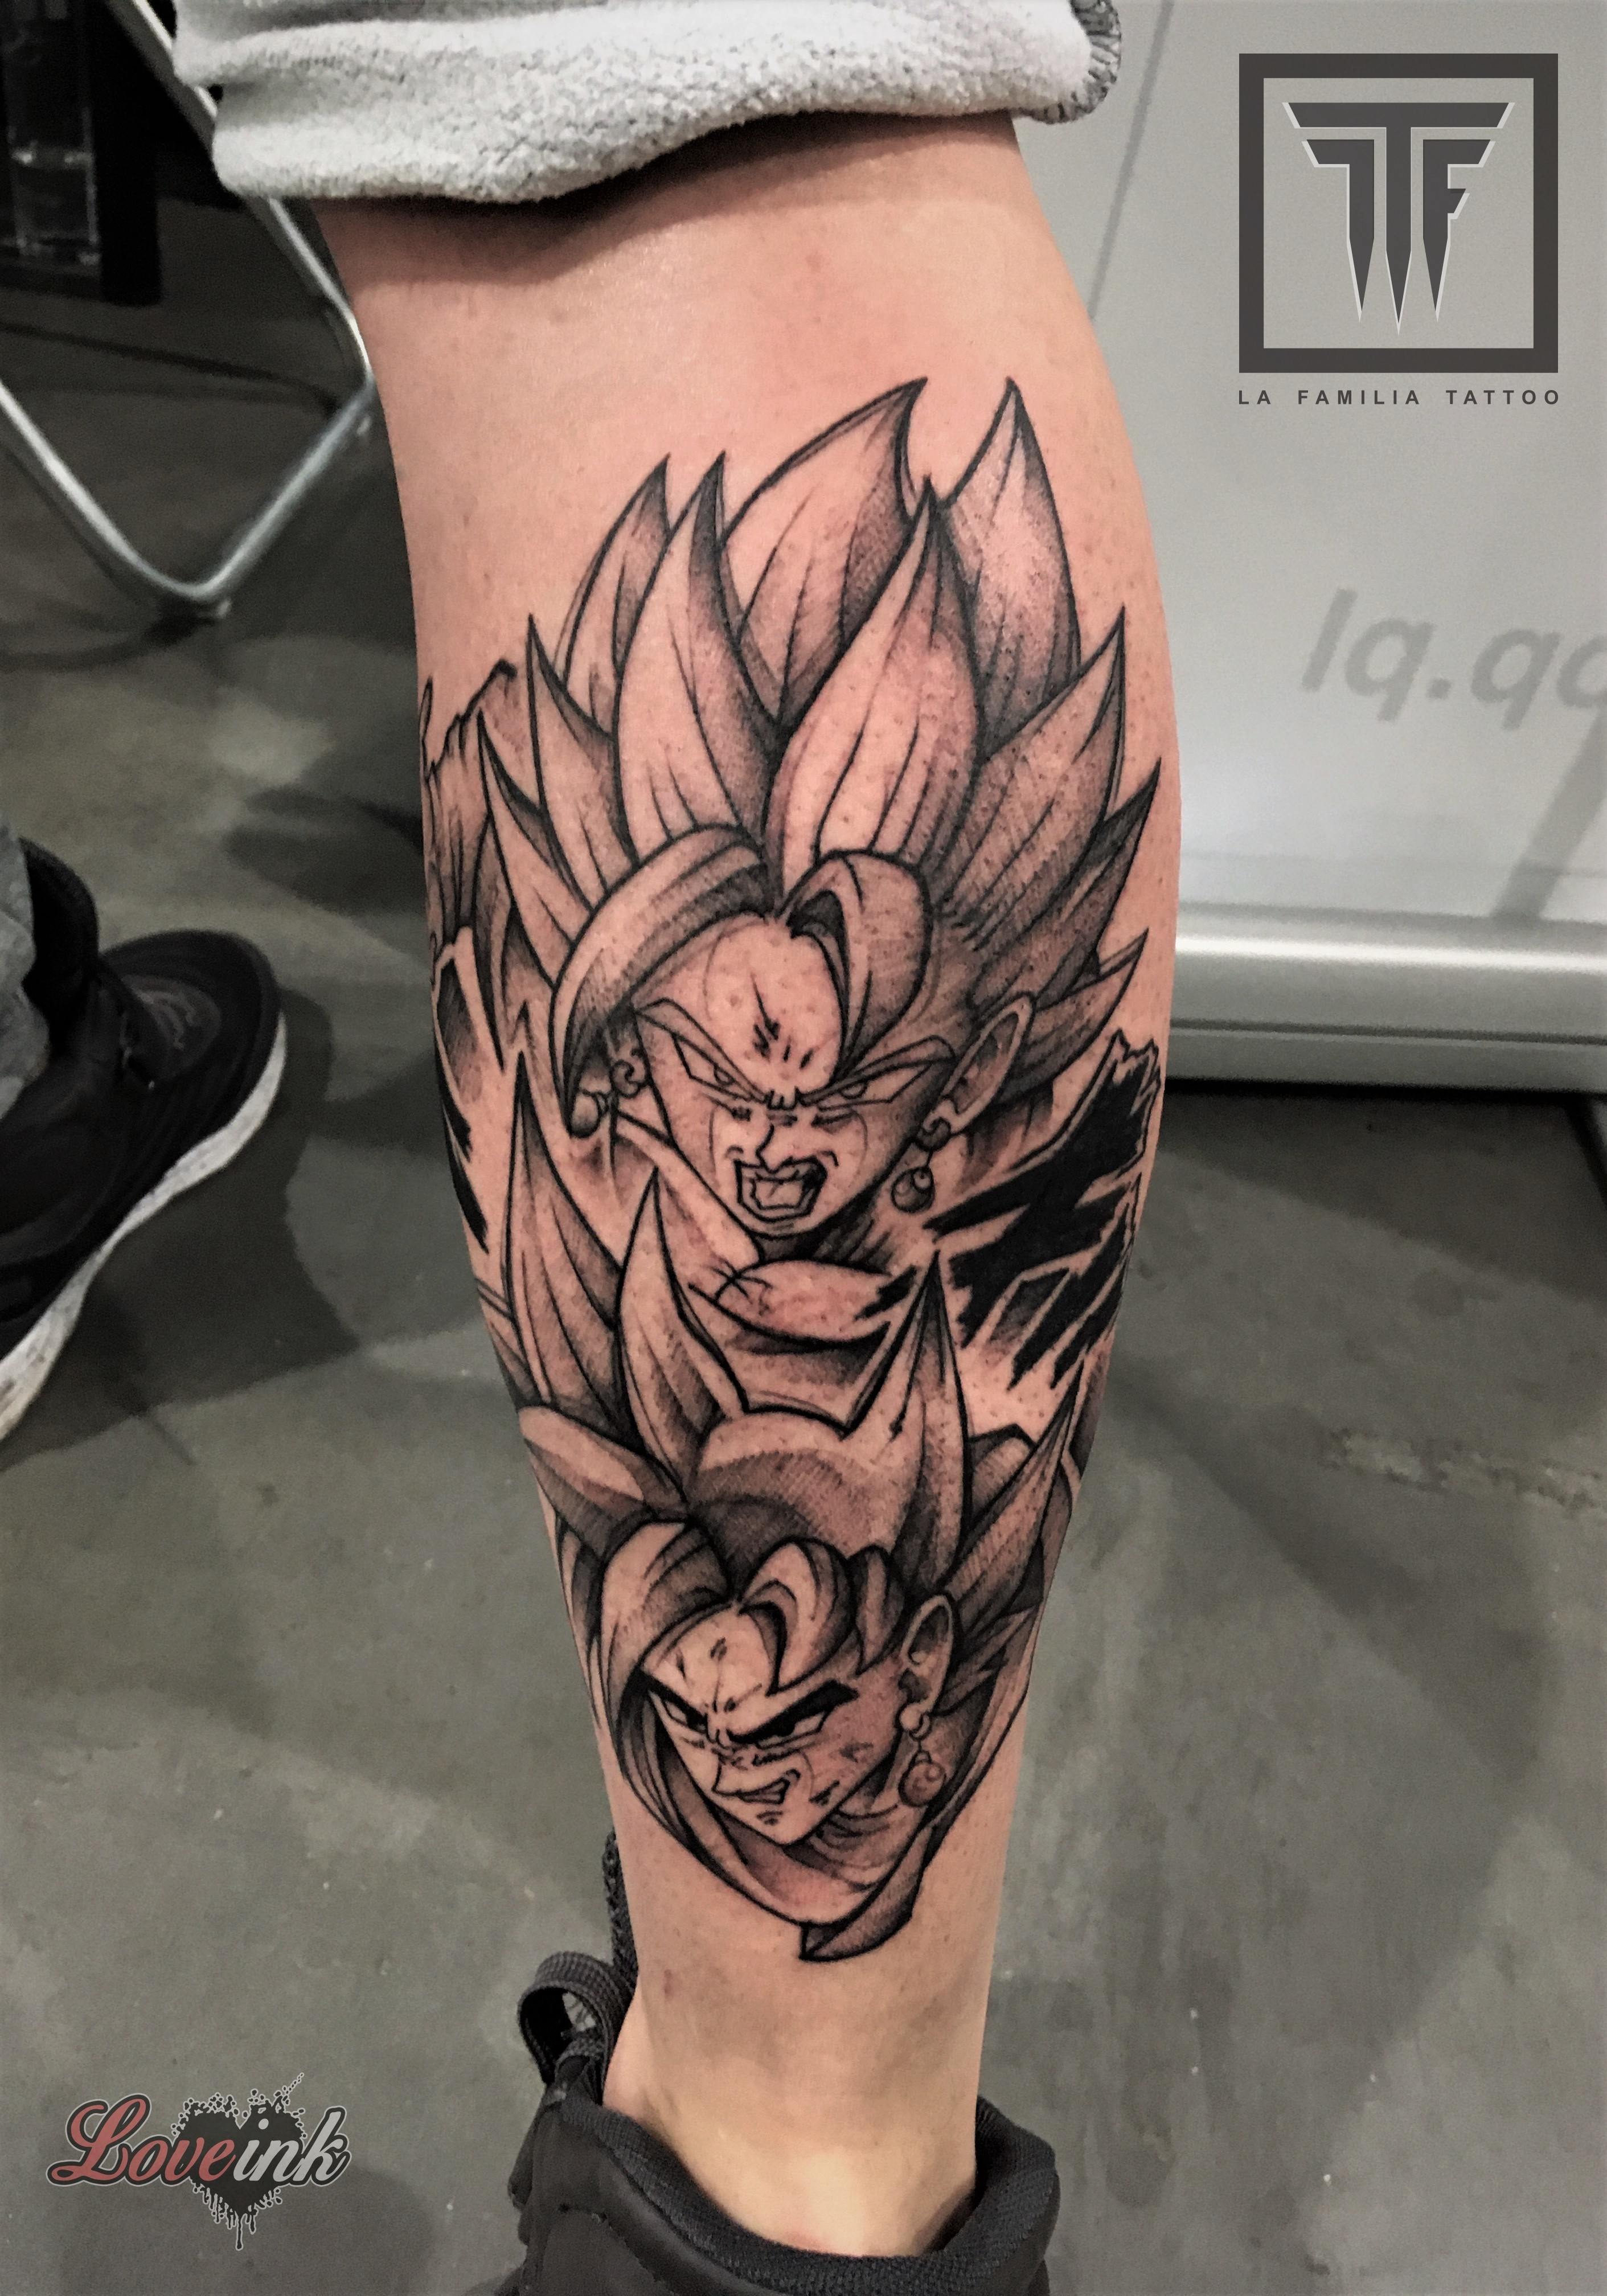 Inksearch tattoo Kacper Malins